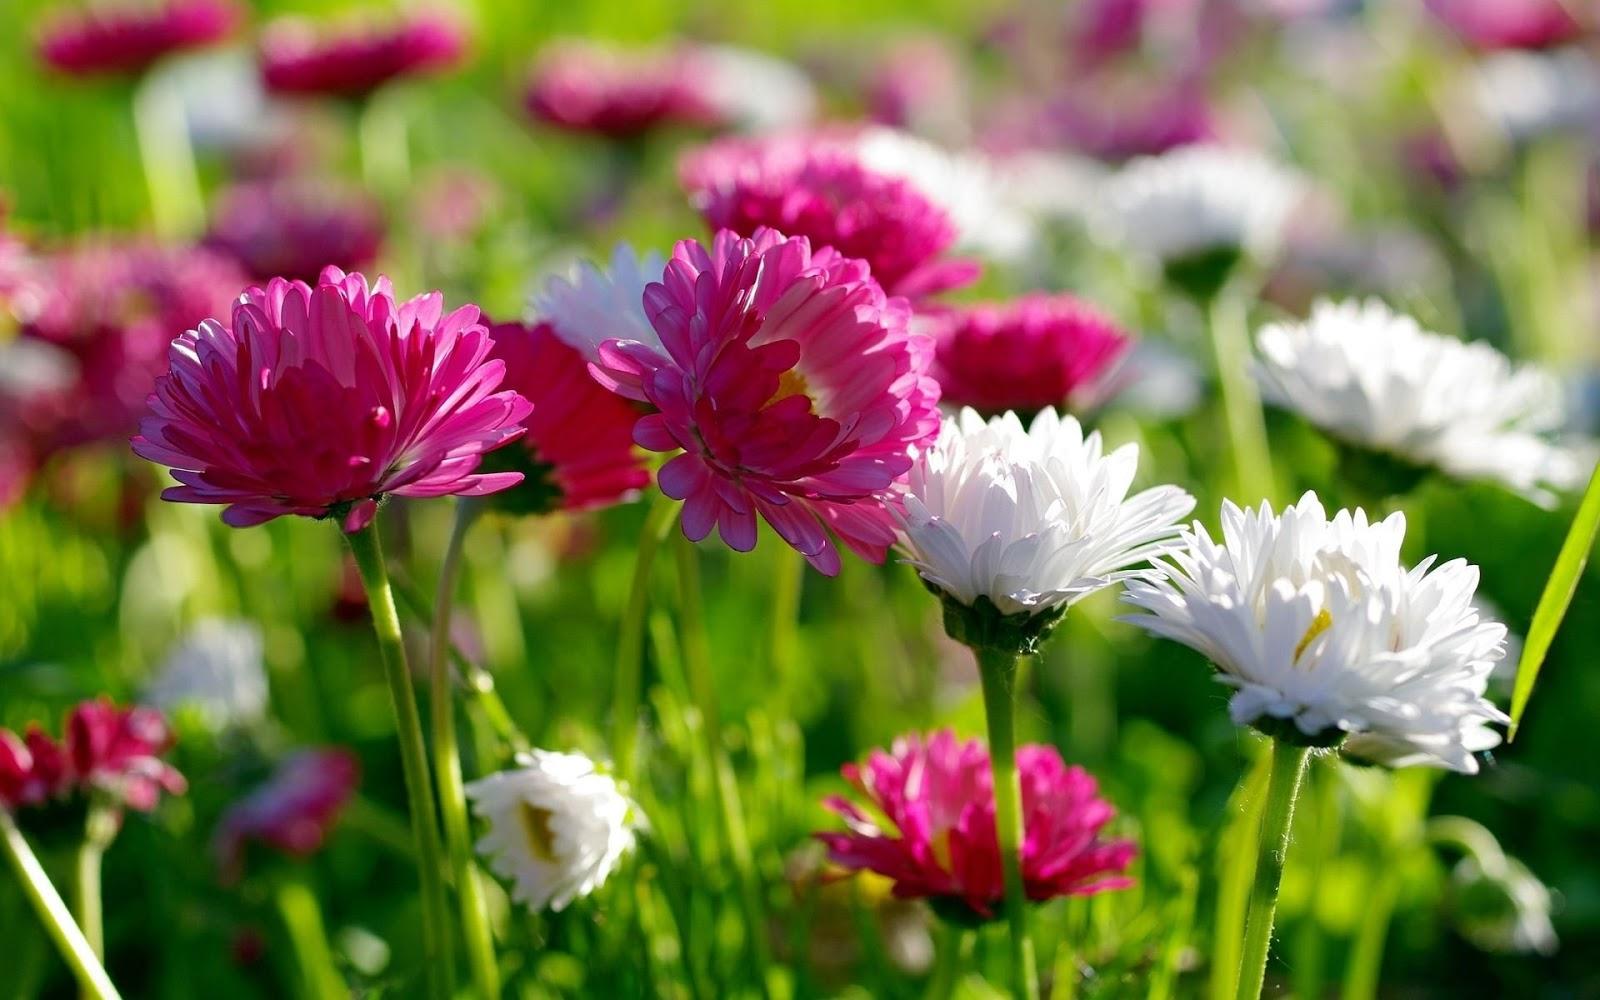 HD WALLPAPERS FOR DESKTOP spring flowers 1600x1000